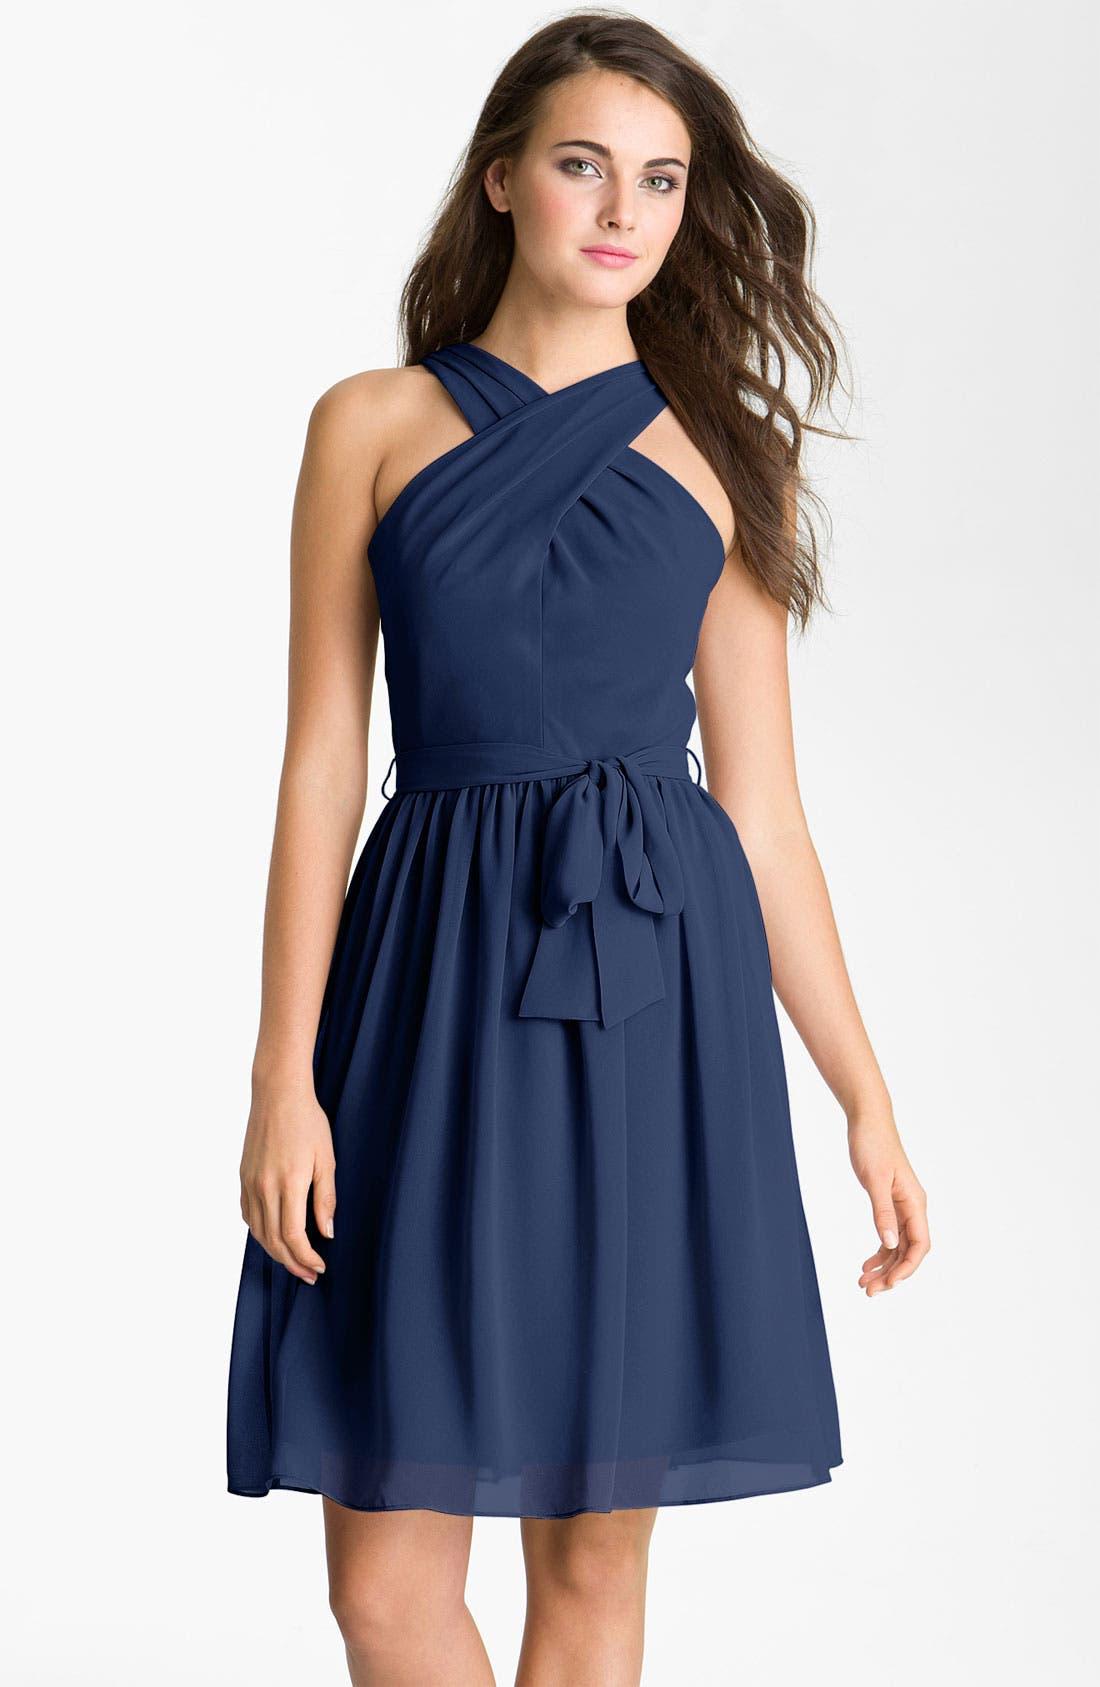 Alternate Image 1 Selected - Donna Morgan Crisscross Chiffon Dress